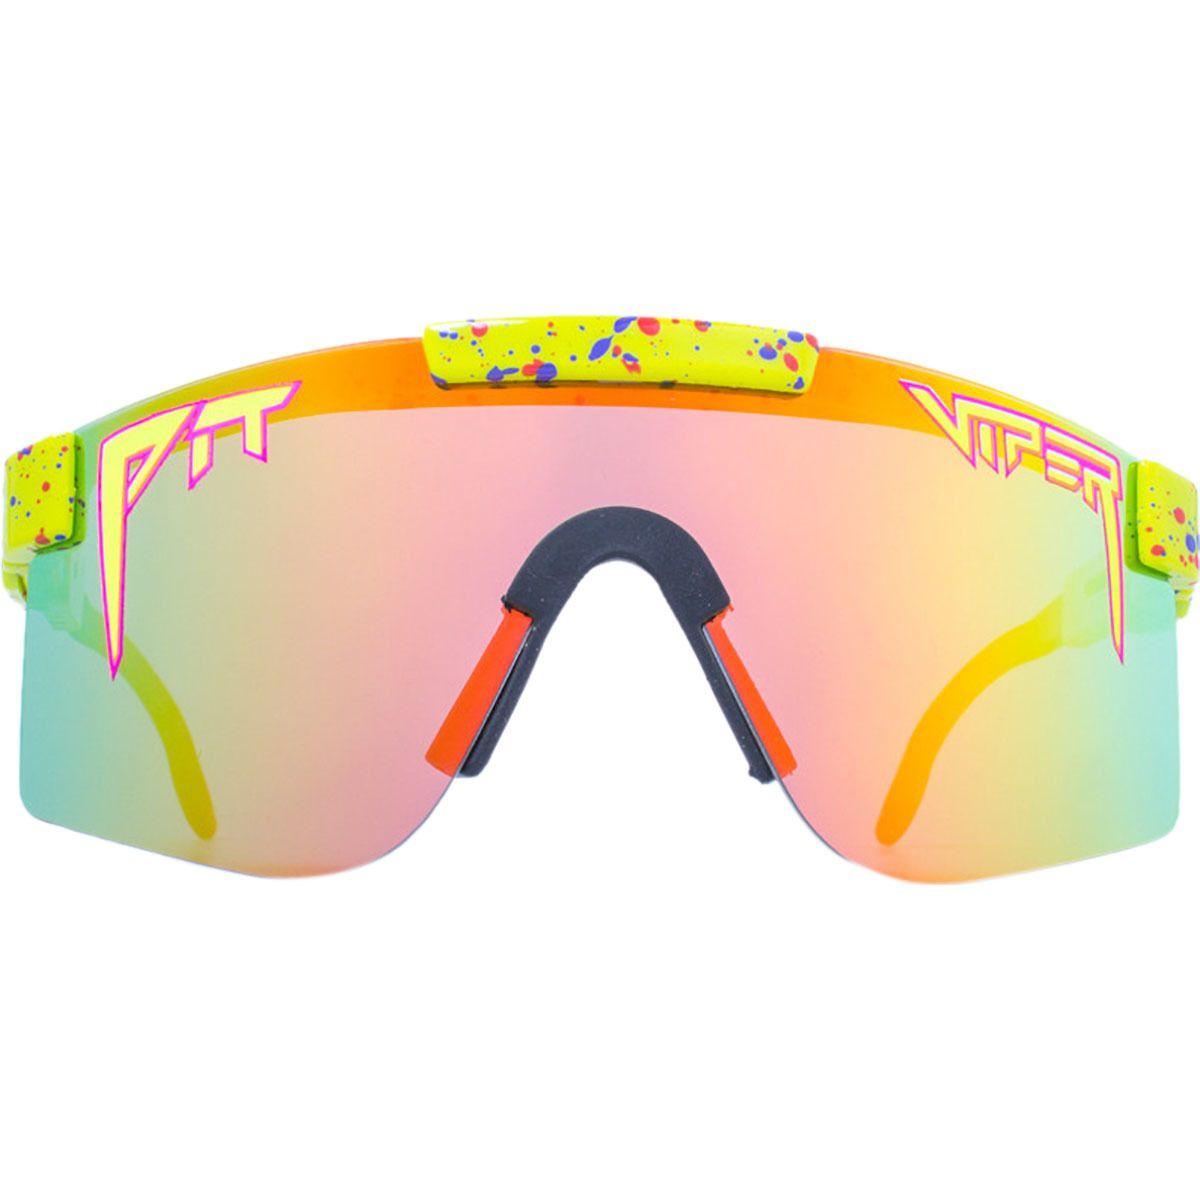 4738a758a87d Pit Viper Pit Viper Sunglasses Polarized eBay